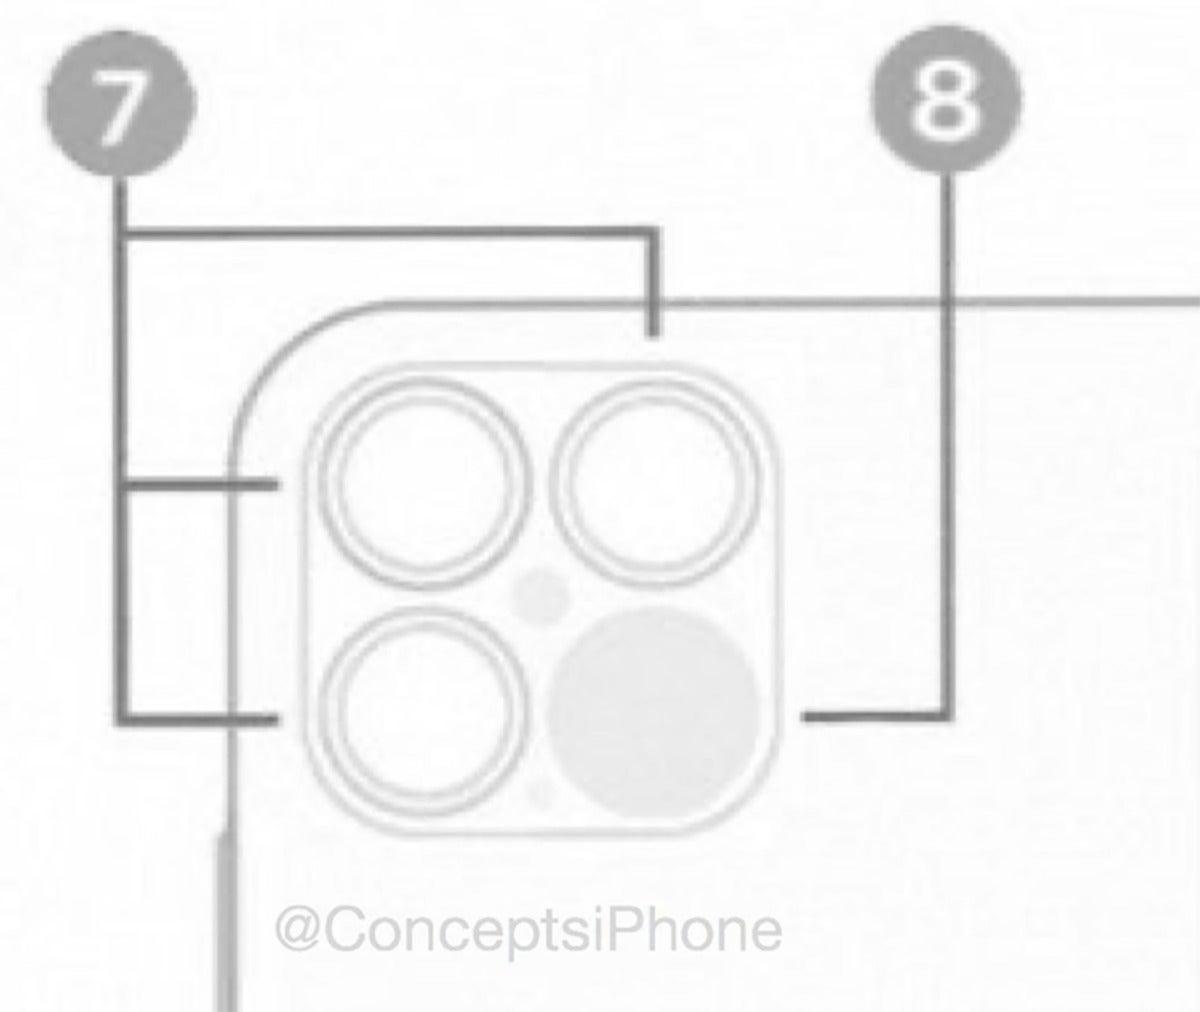 iPhone 12 rumors: 5G, OLED, camera, processor, and more